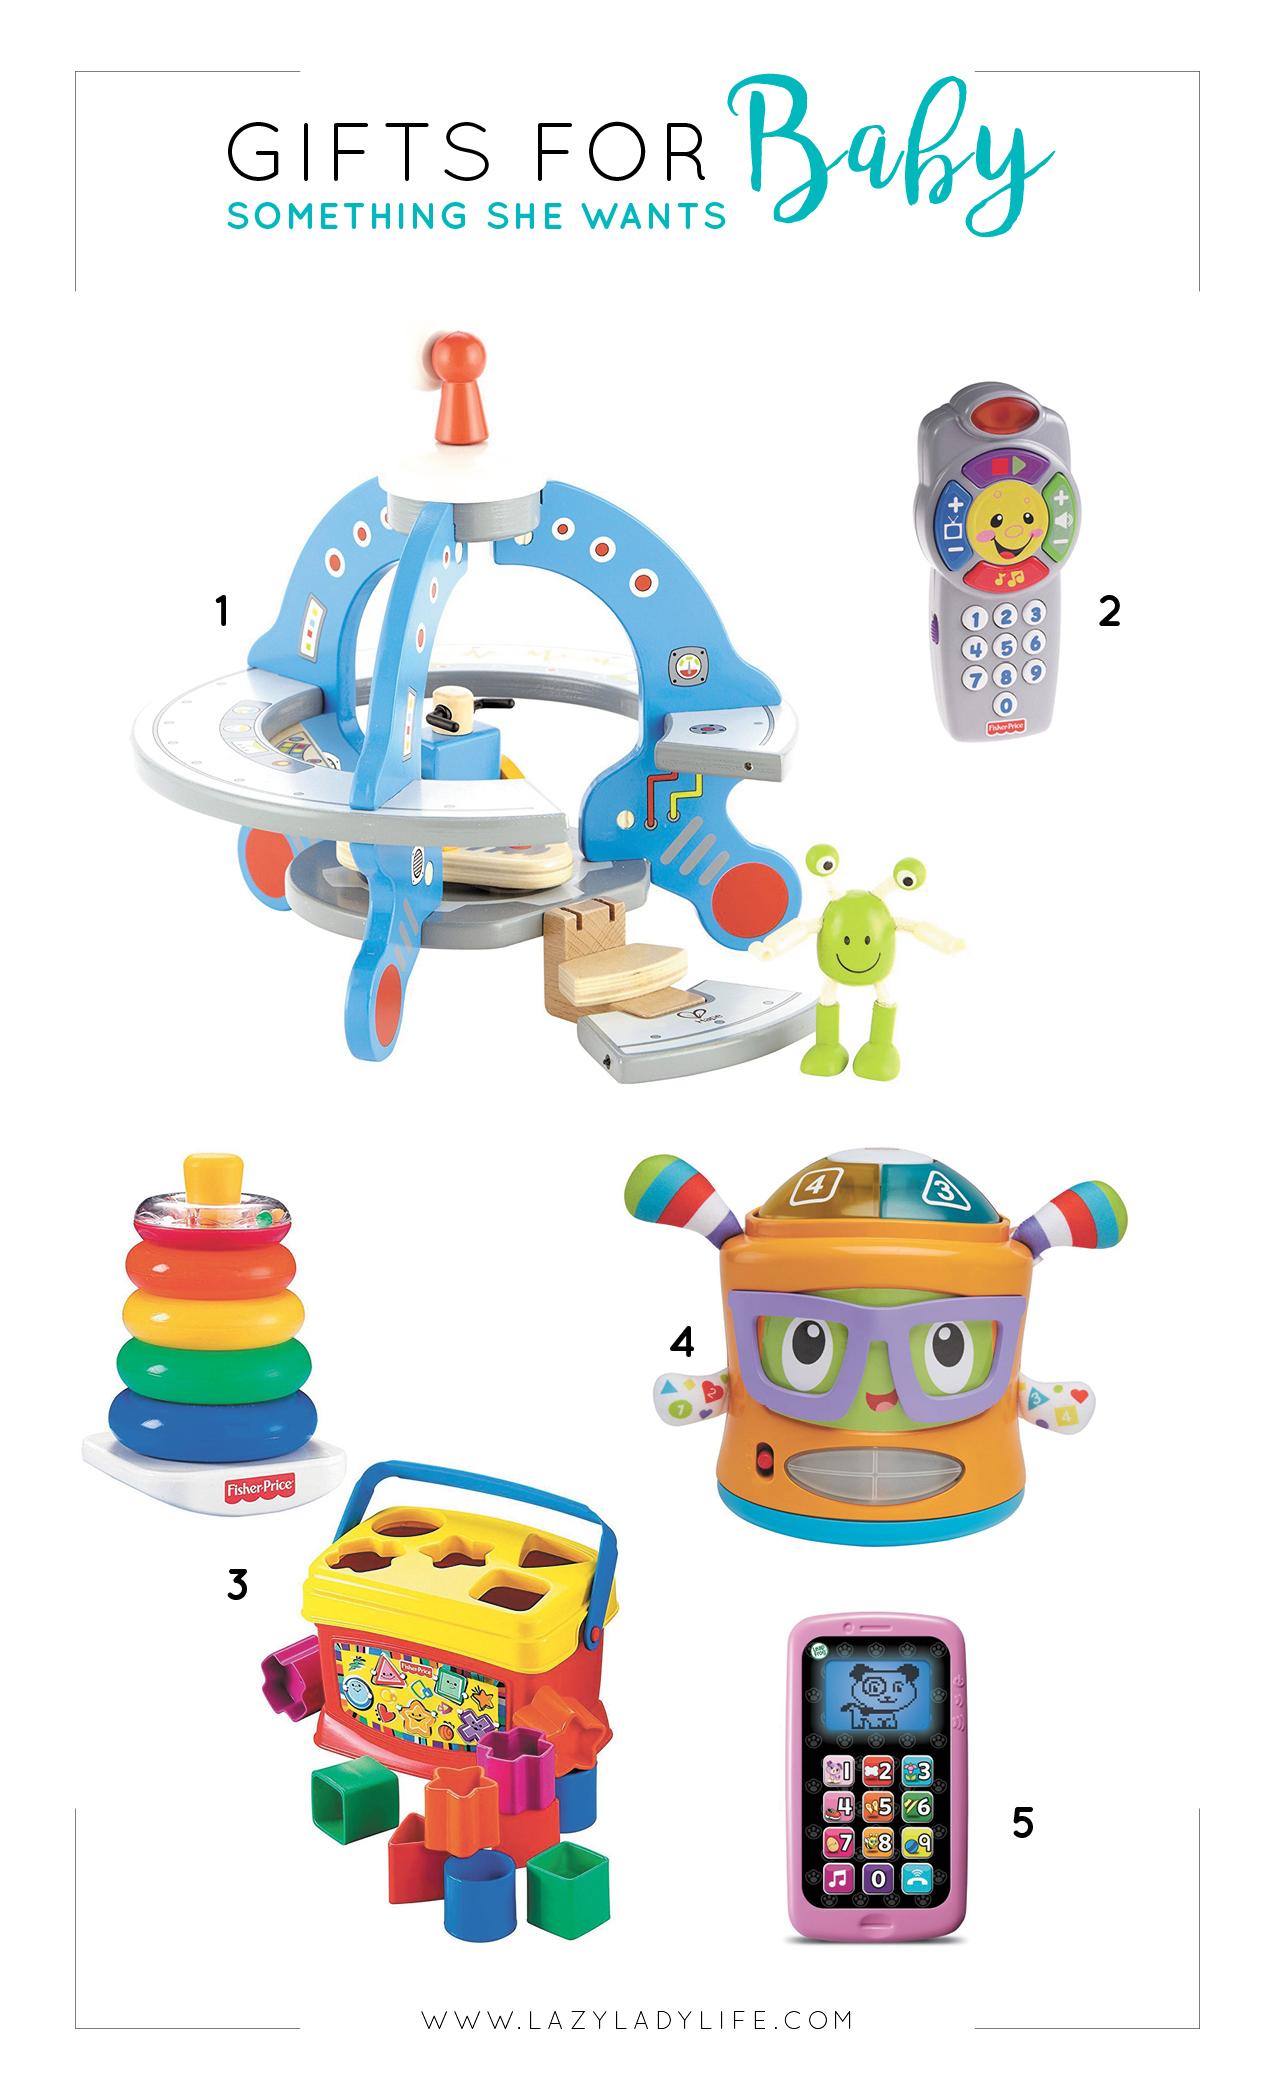 Baby-Gift-Guide-Wants.jpg